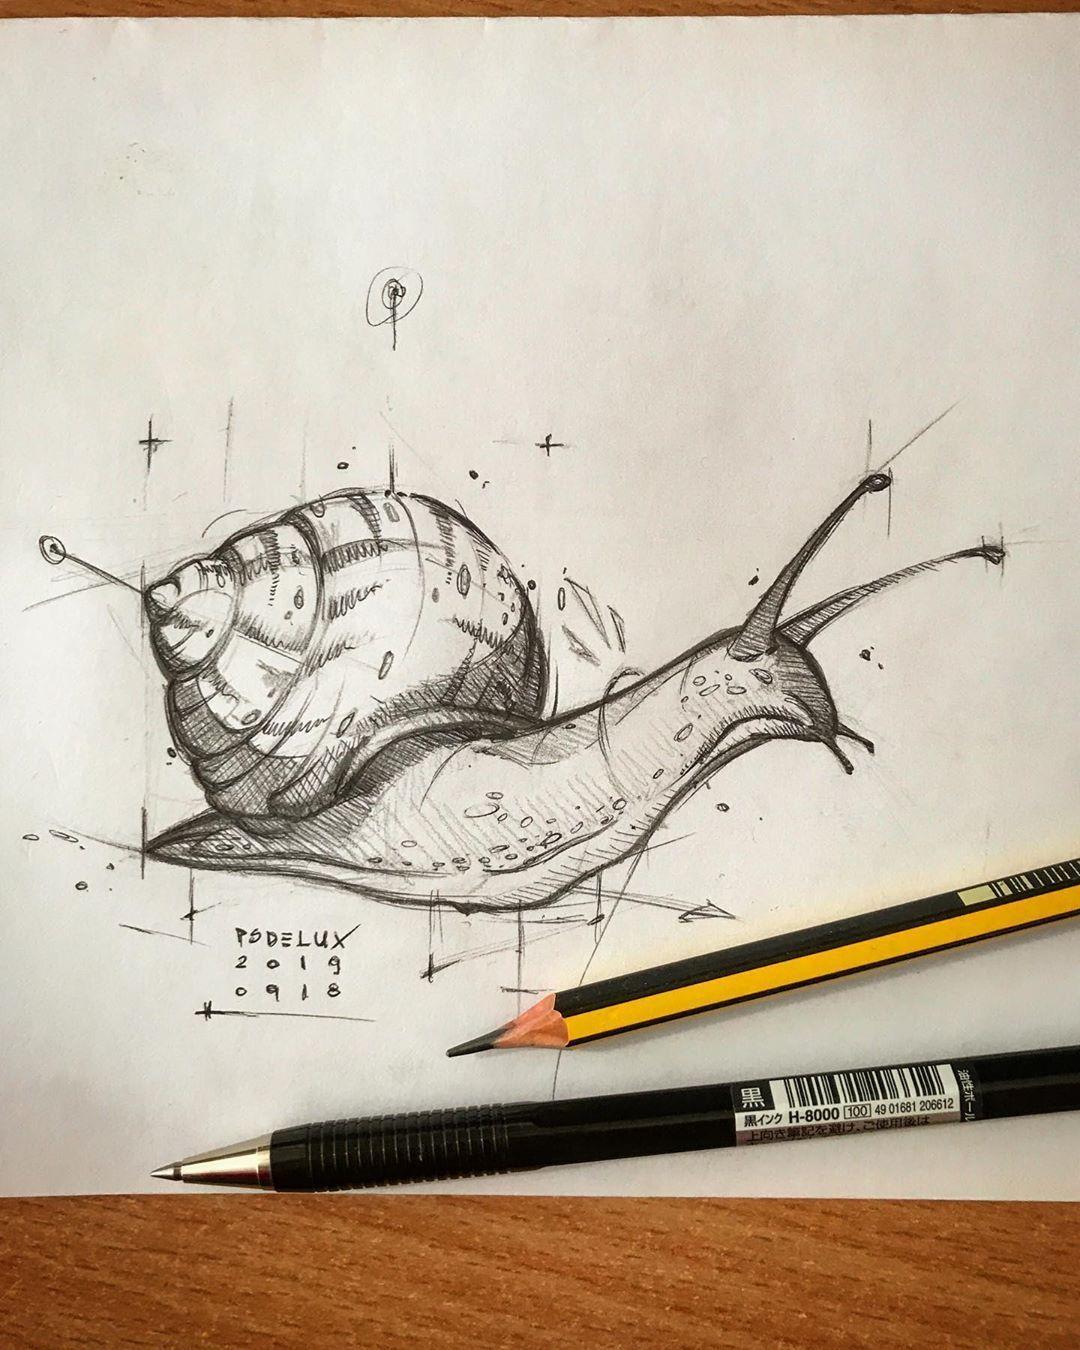 Pencil sketch artist Psdelux